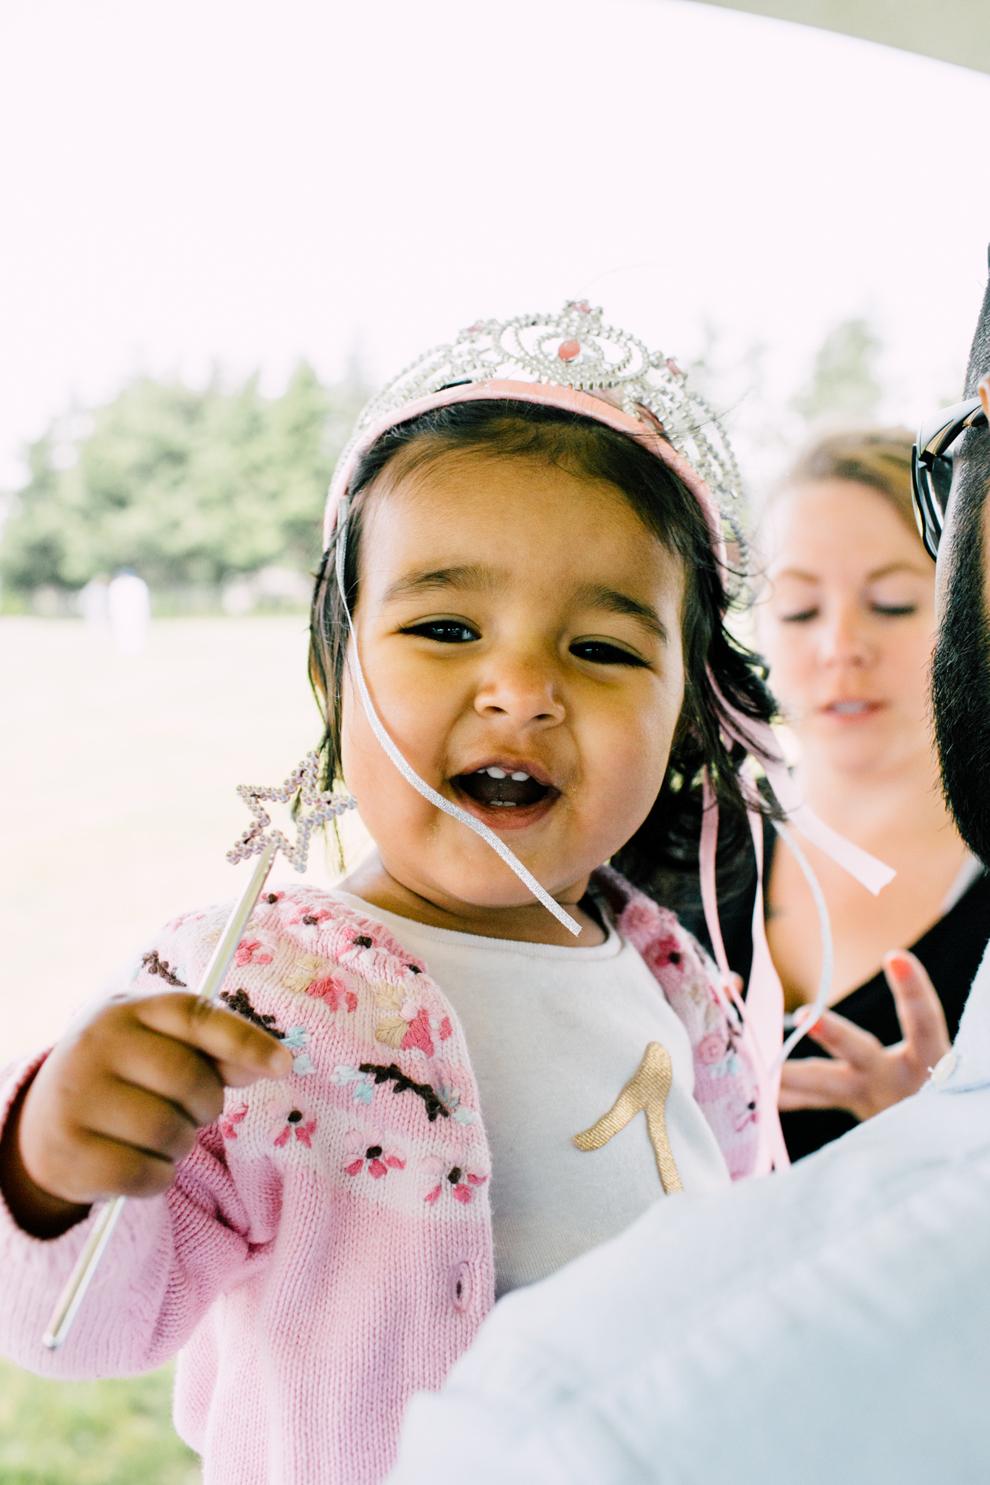 037-one-year-birthday-party-event-photography-lynden-bellingham-katheryn-moran-mira.jpg